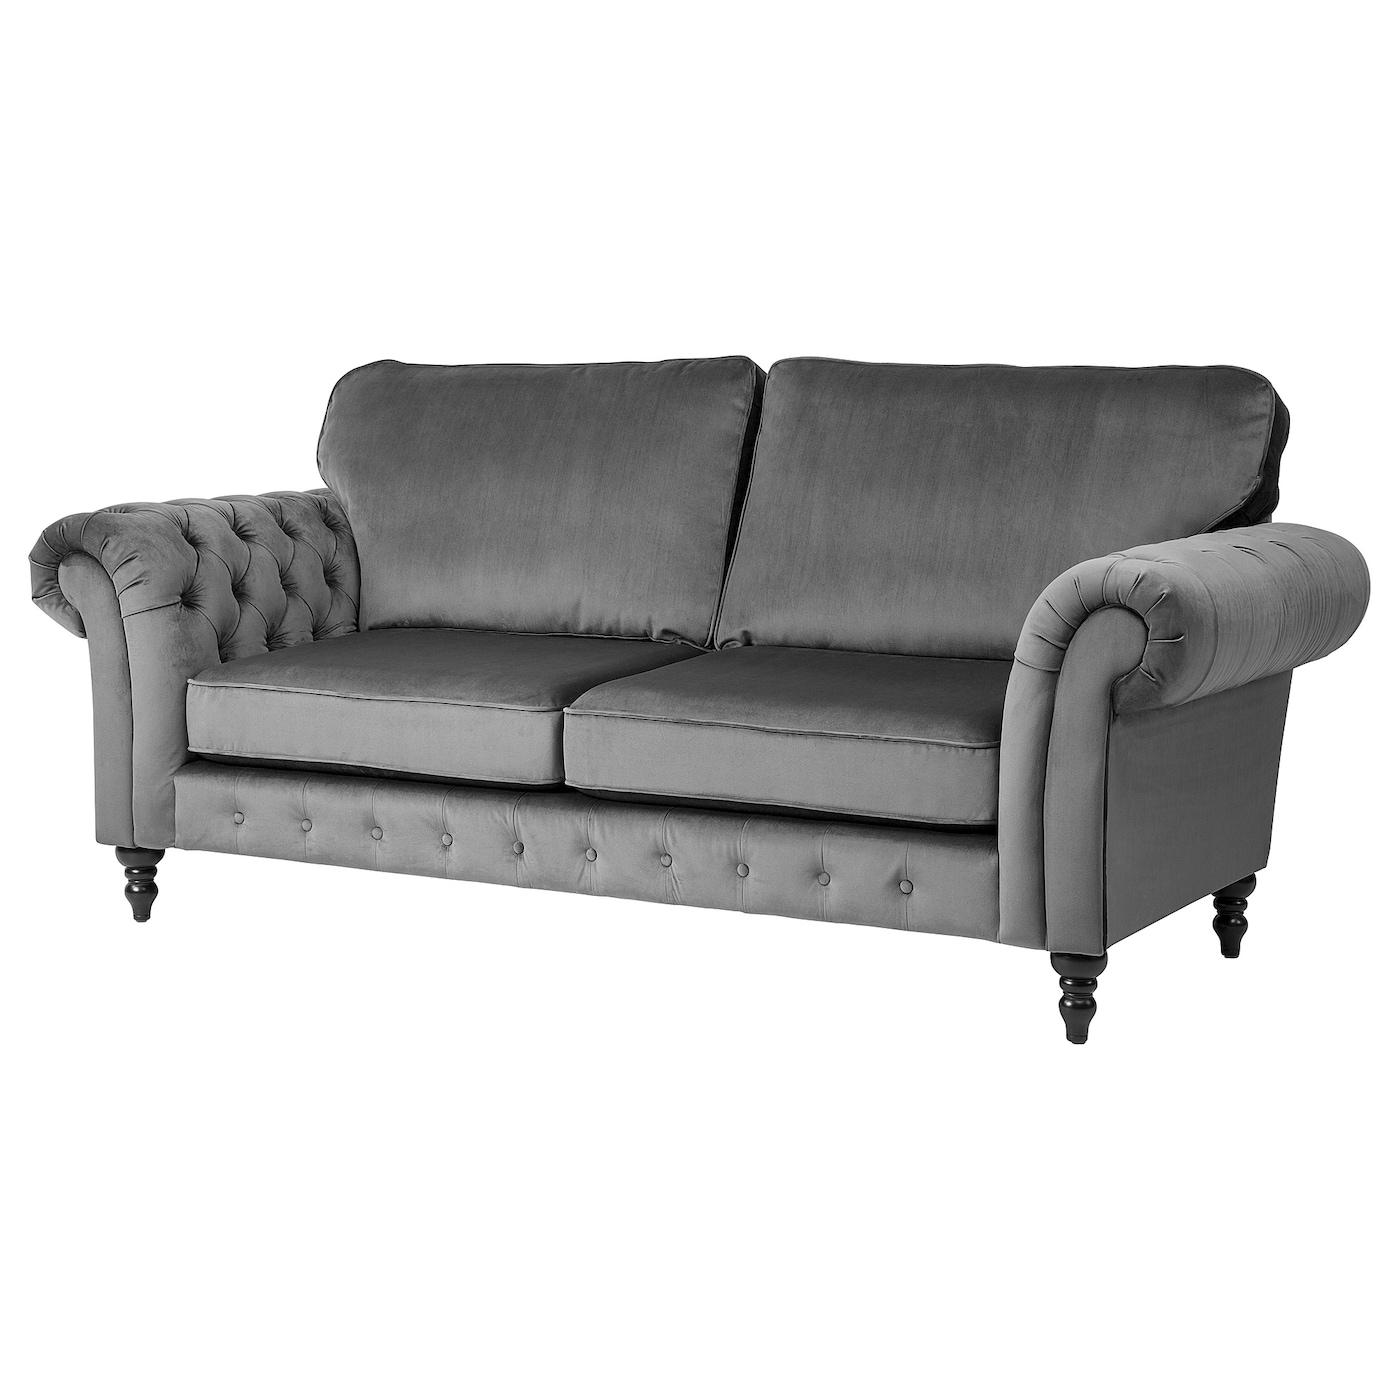 Grevie Velvet Grey 3 Seat Sofa Ikea